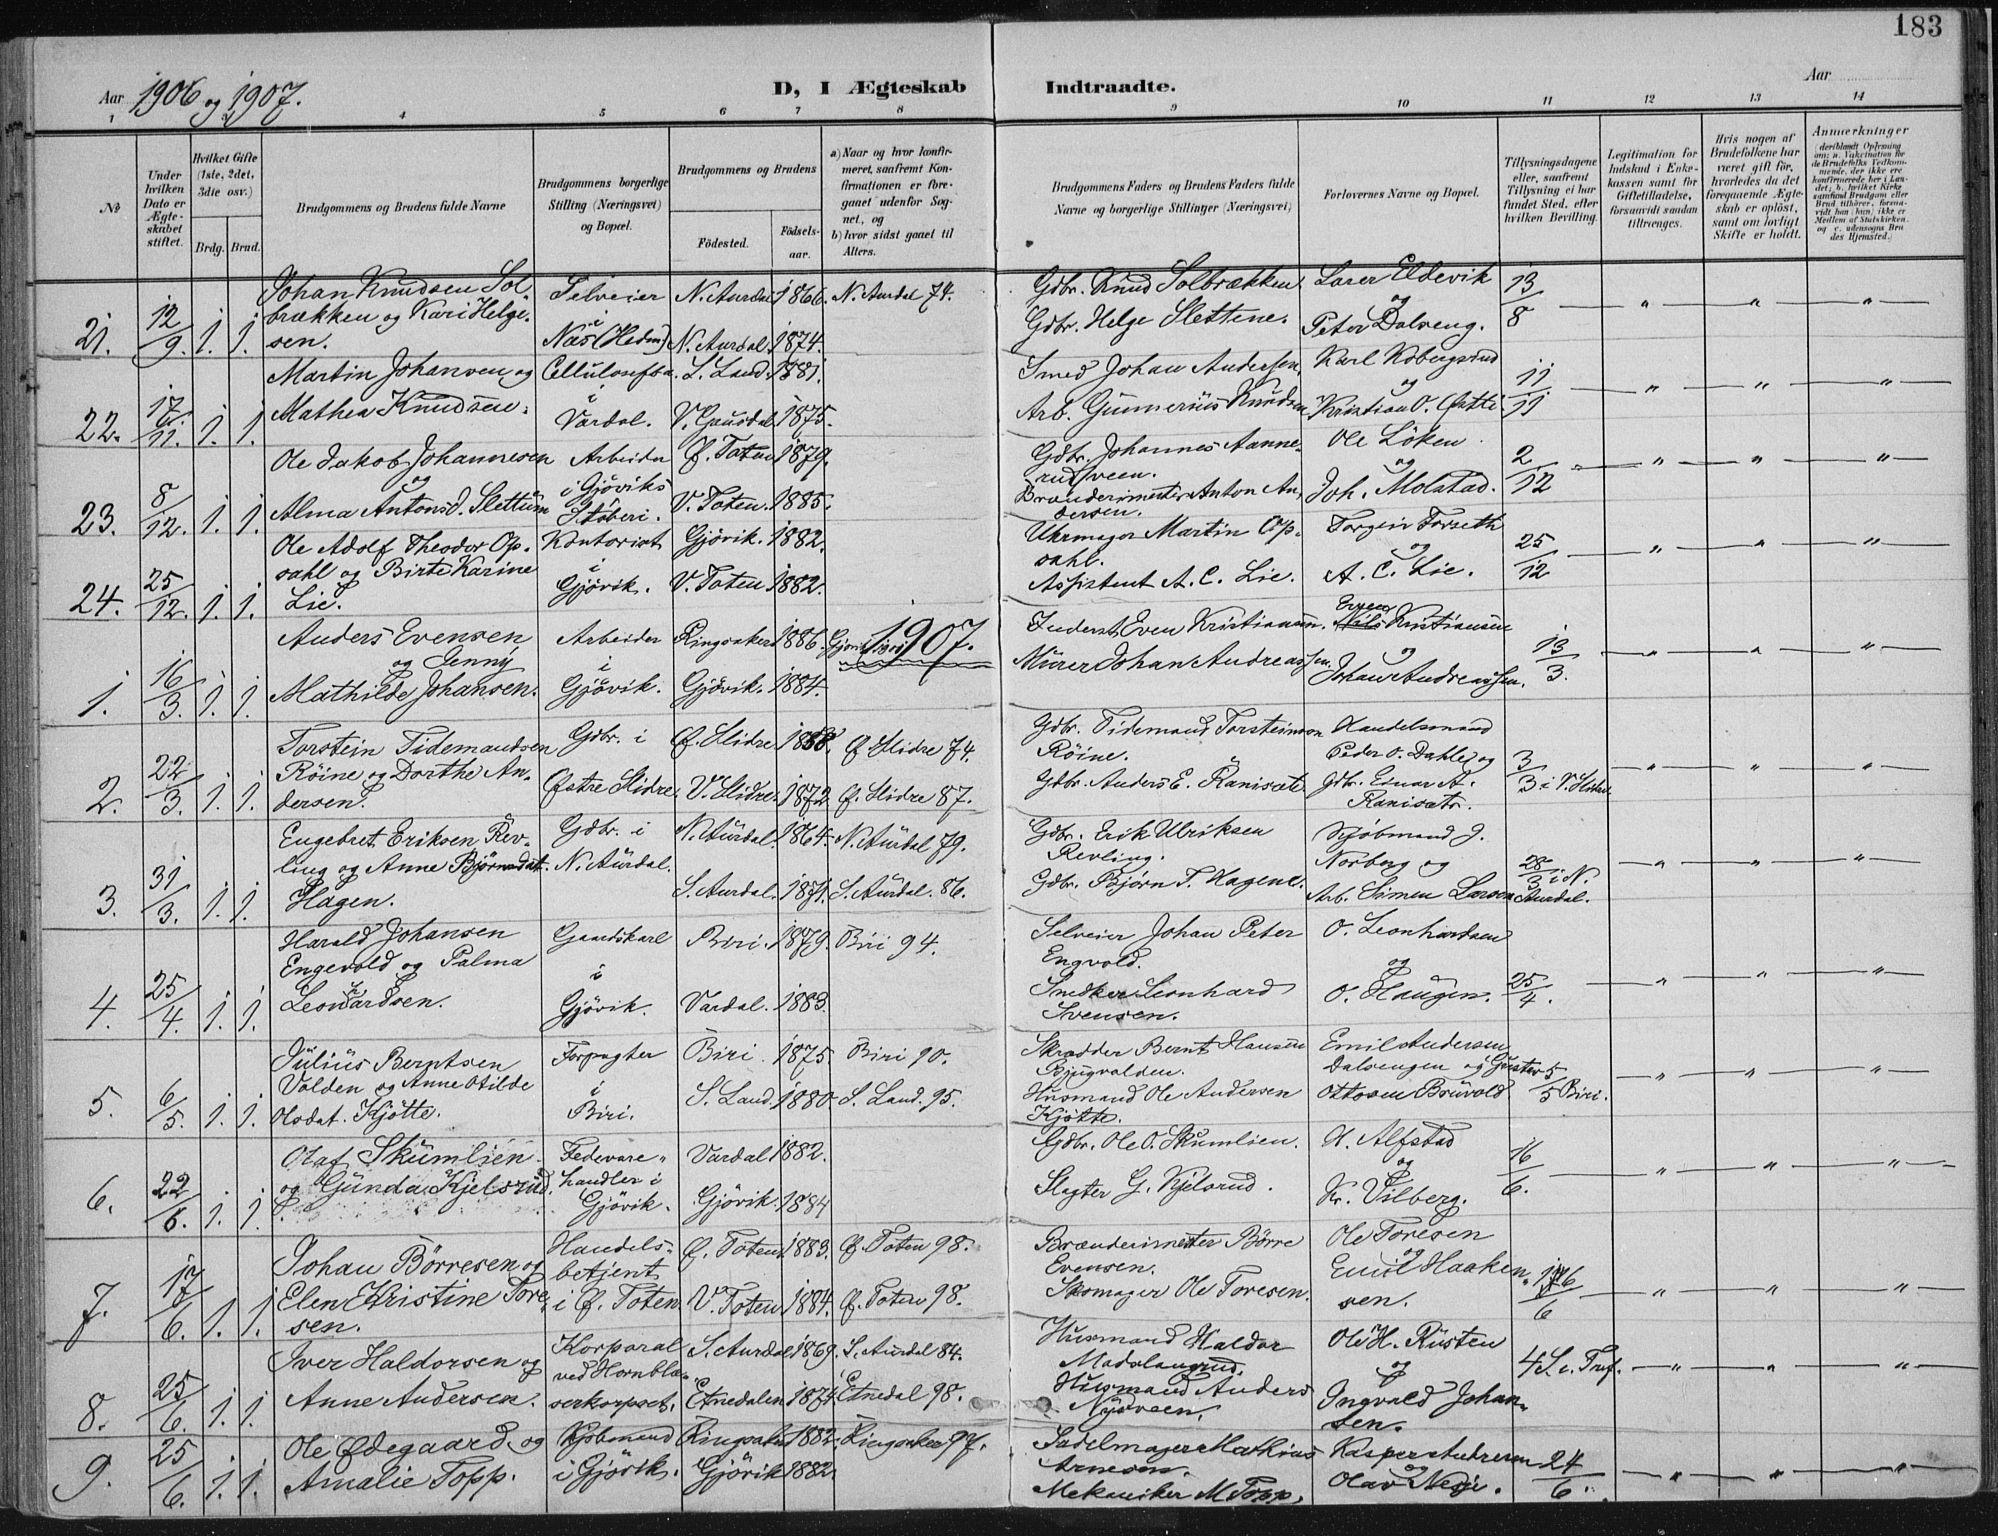 SAH, Vardal prestekontor, H/Ha/Haa/L0013: Ministerialbok nr. 13, 1901-1911, s. 183